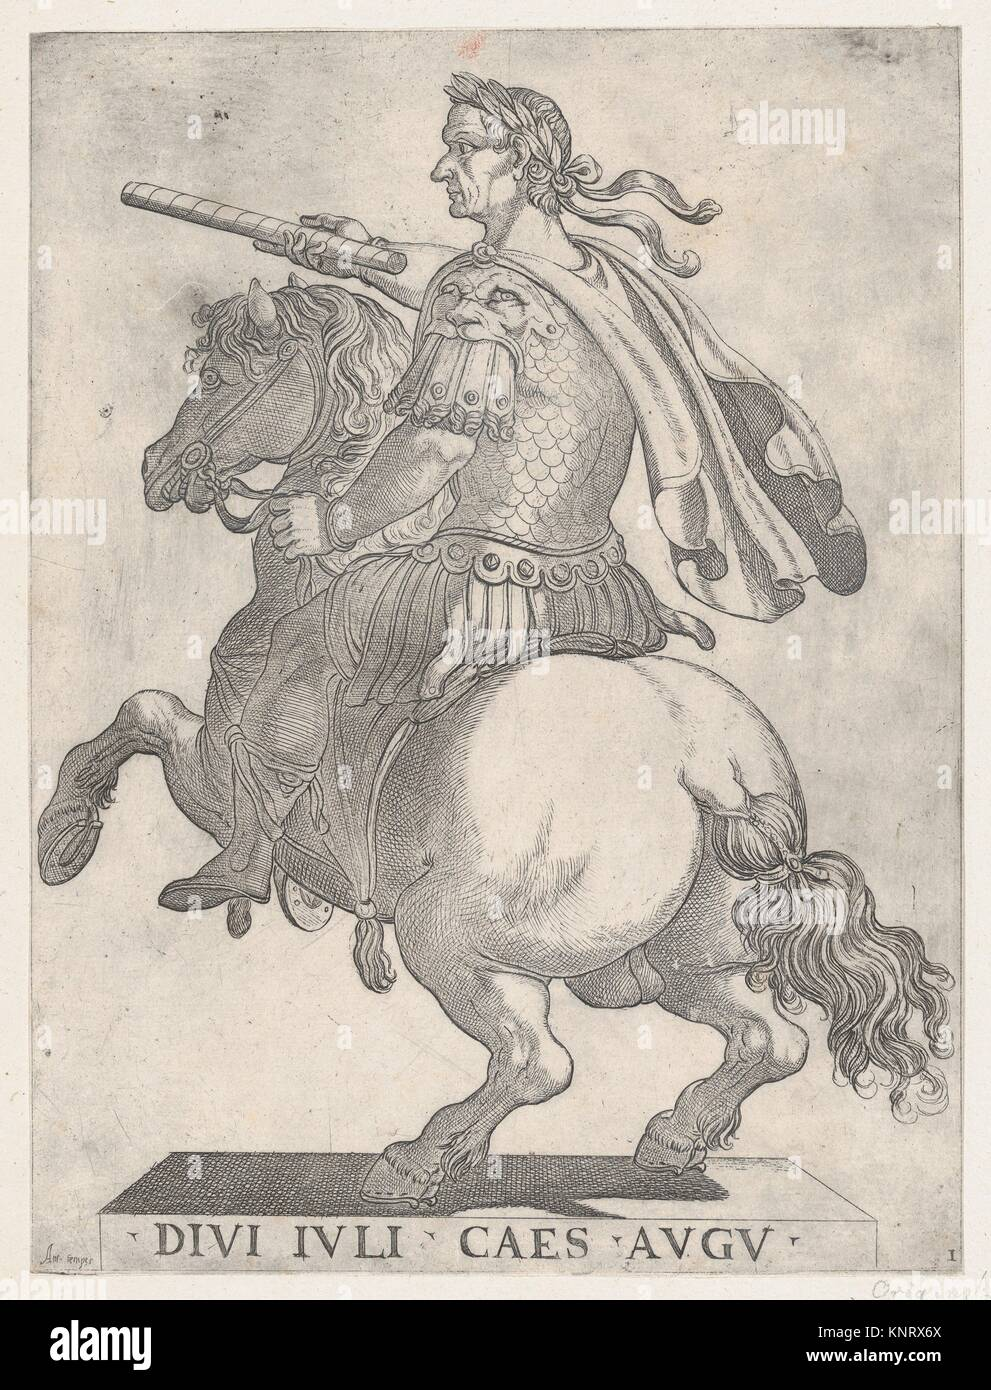 Plate 1: Emperor Julius Caesar on Horseback, from ´The First Twelve Roman Caesars´. Artist: Antonio Tempesta (Italian, Stock Photo